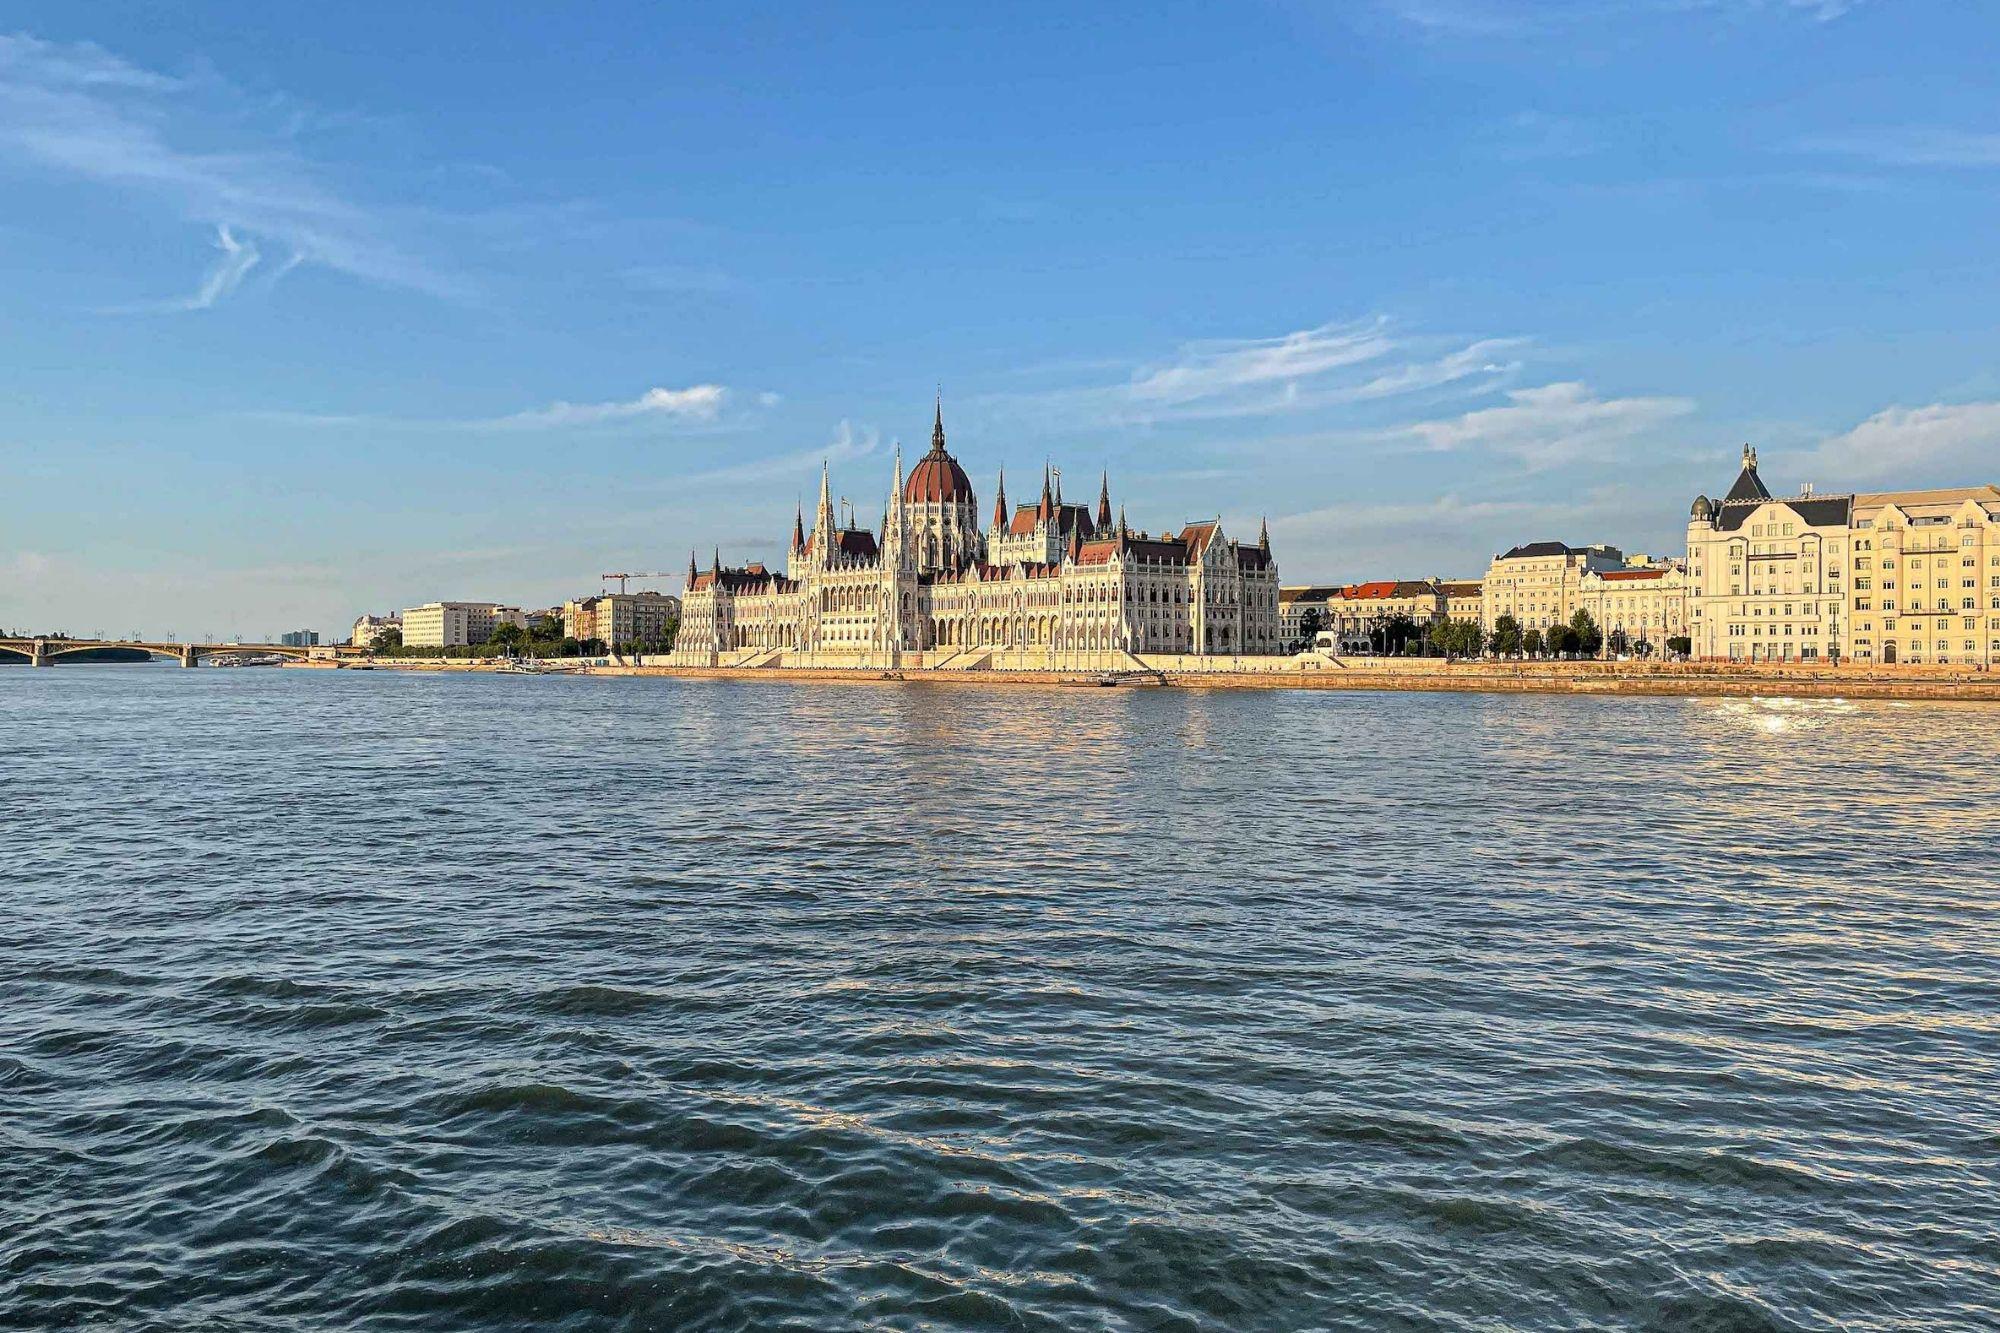 MS ALBERTINA Reisebericht Teil 2: Wien, Budapest & traditionelle Folklore